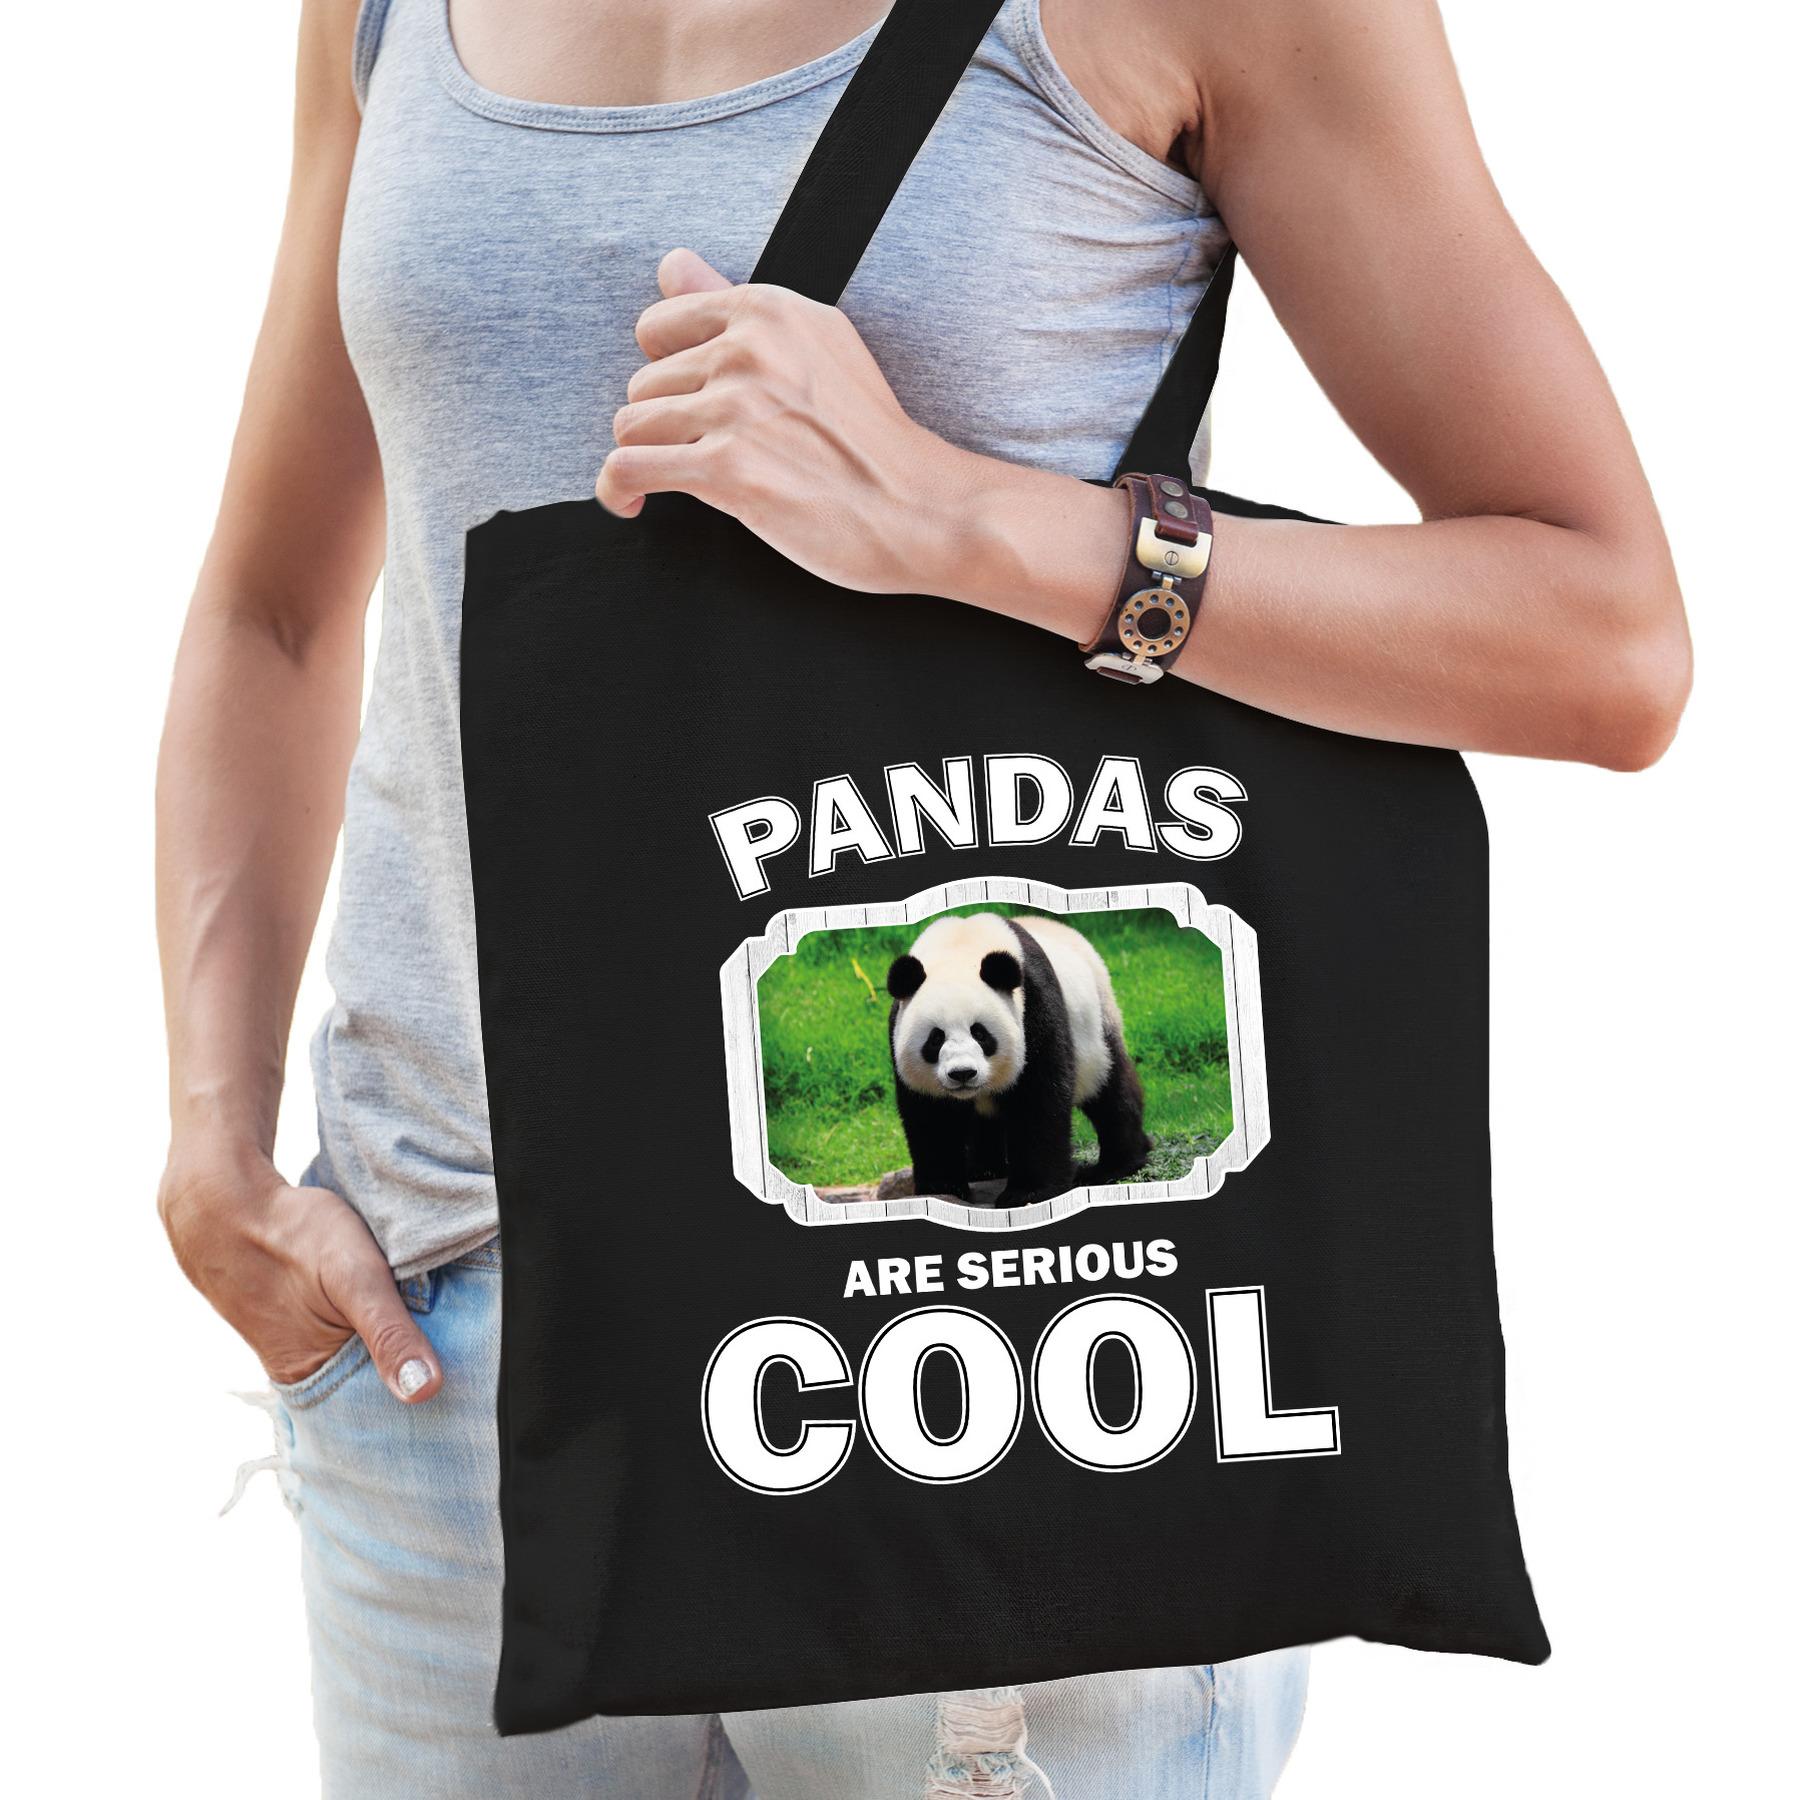 Katoenen tasje pandas are serious cool zwart - pandaberen/ grote panda cadeau tas